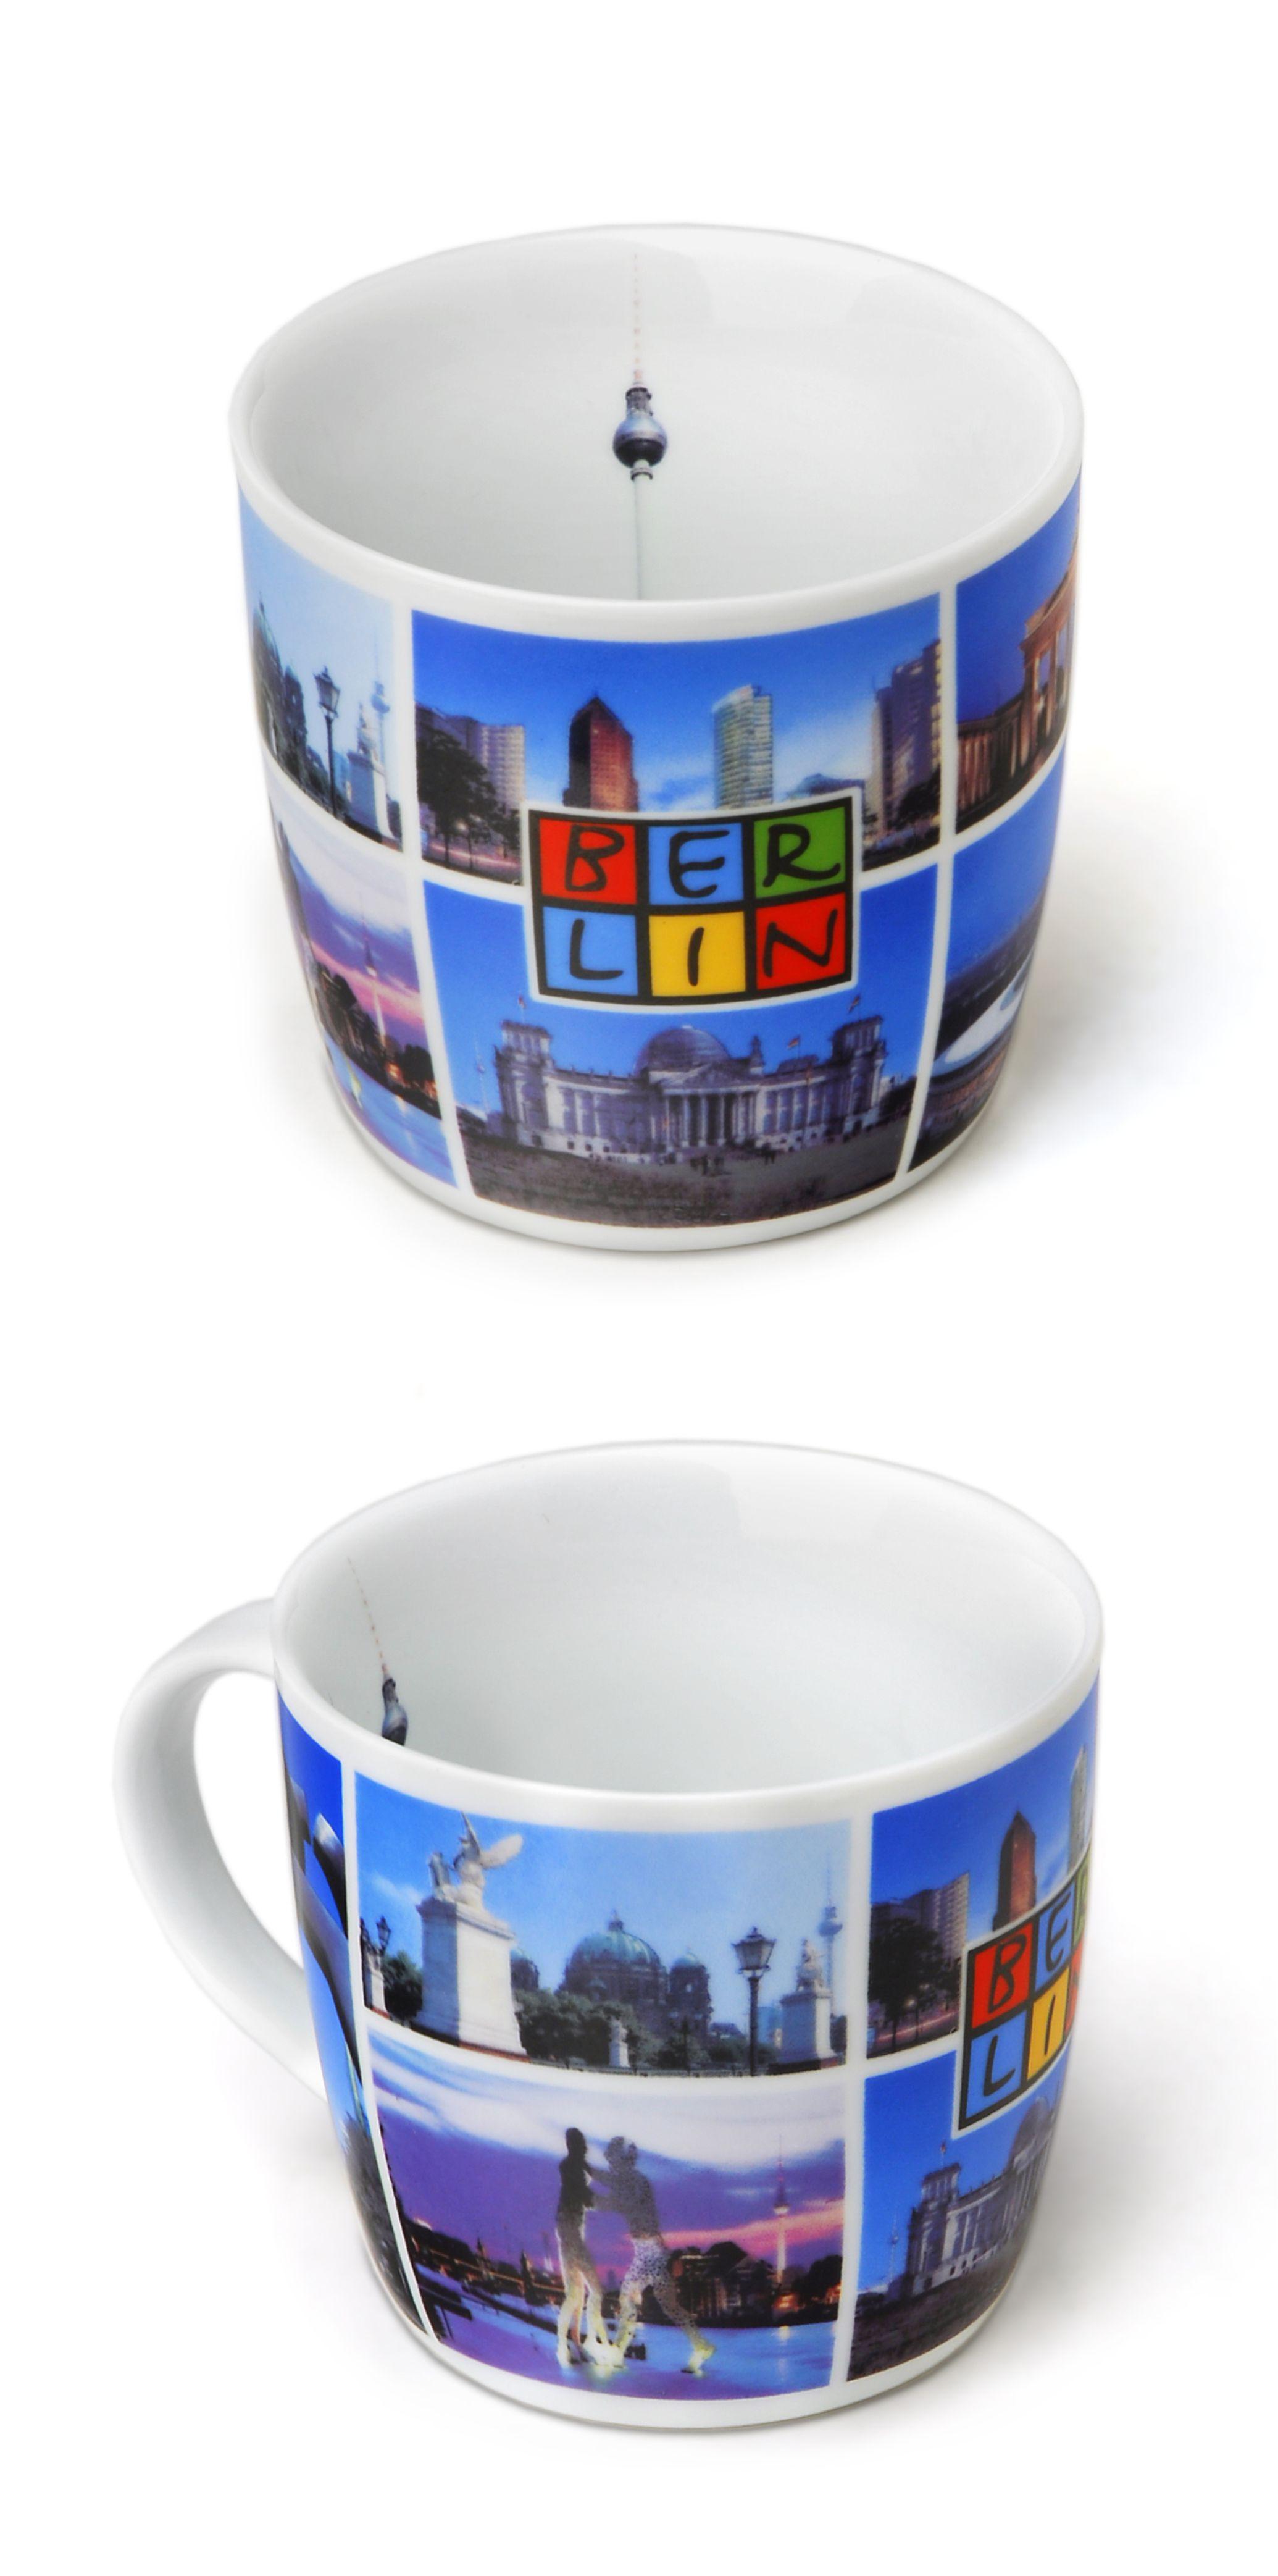 080-3009 Tasse BERLIN mit WEB